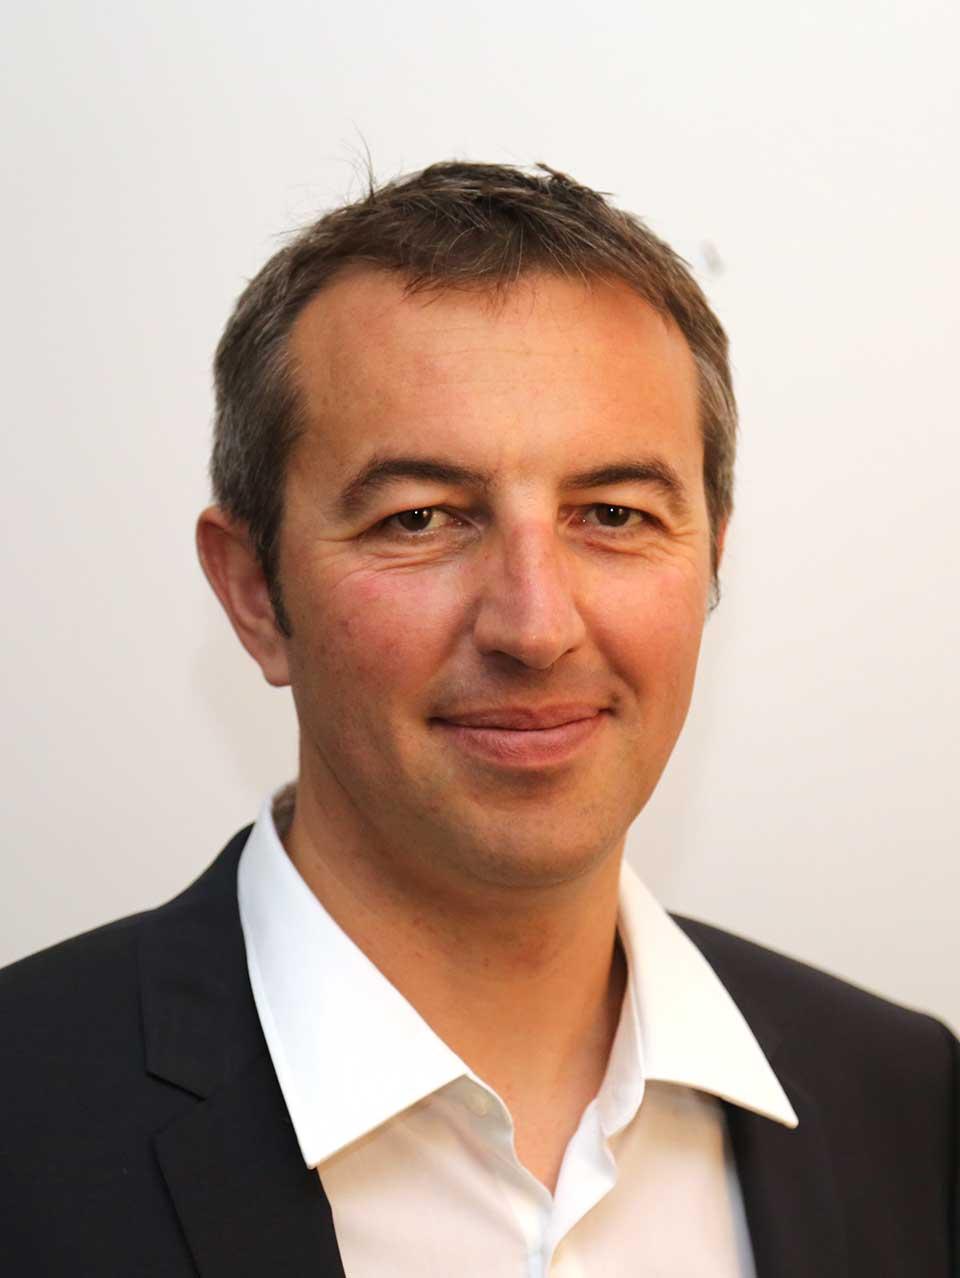 Dr Devillard Arnaud